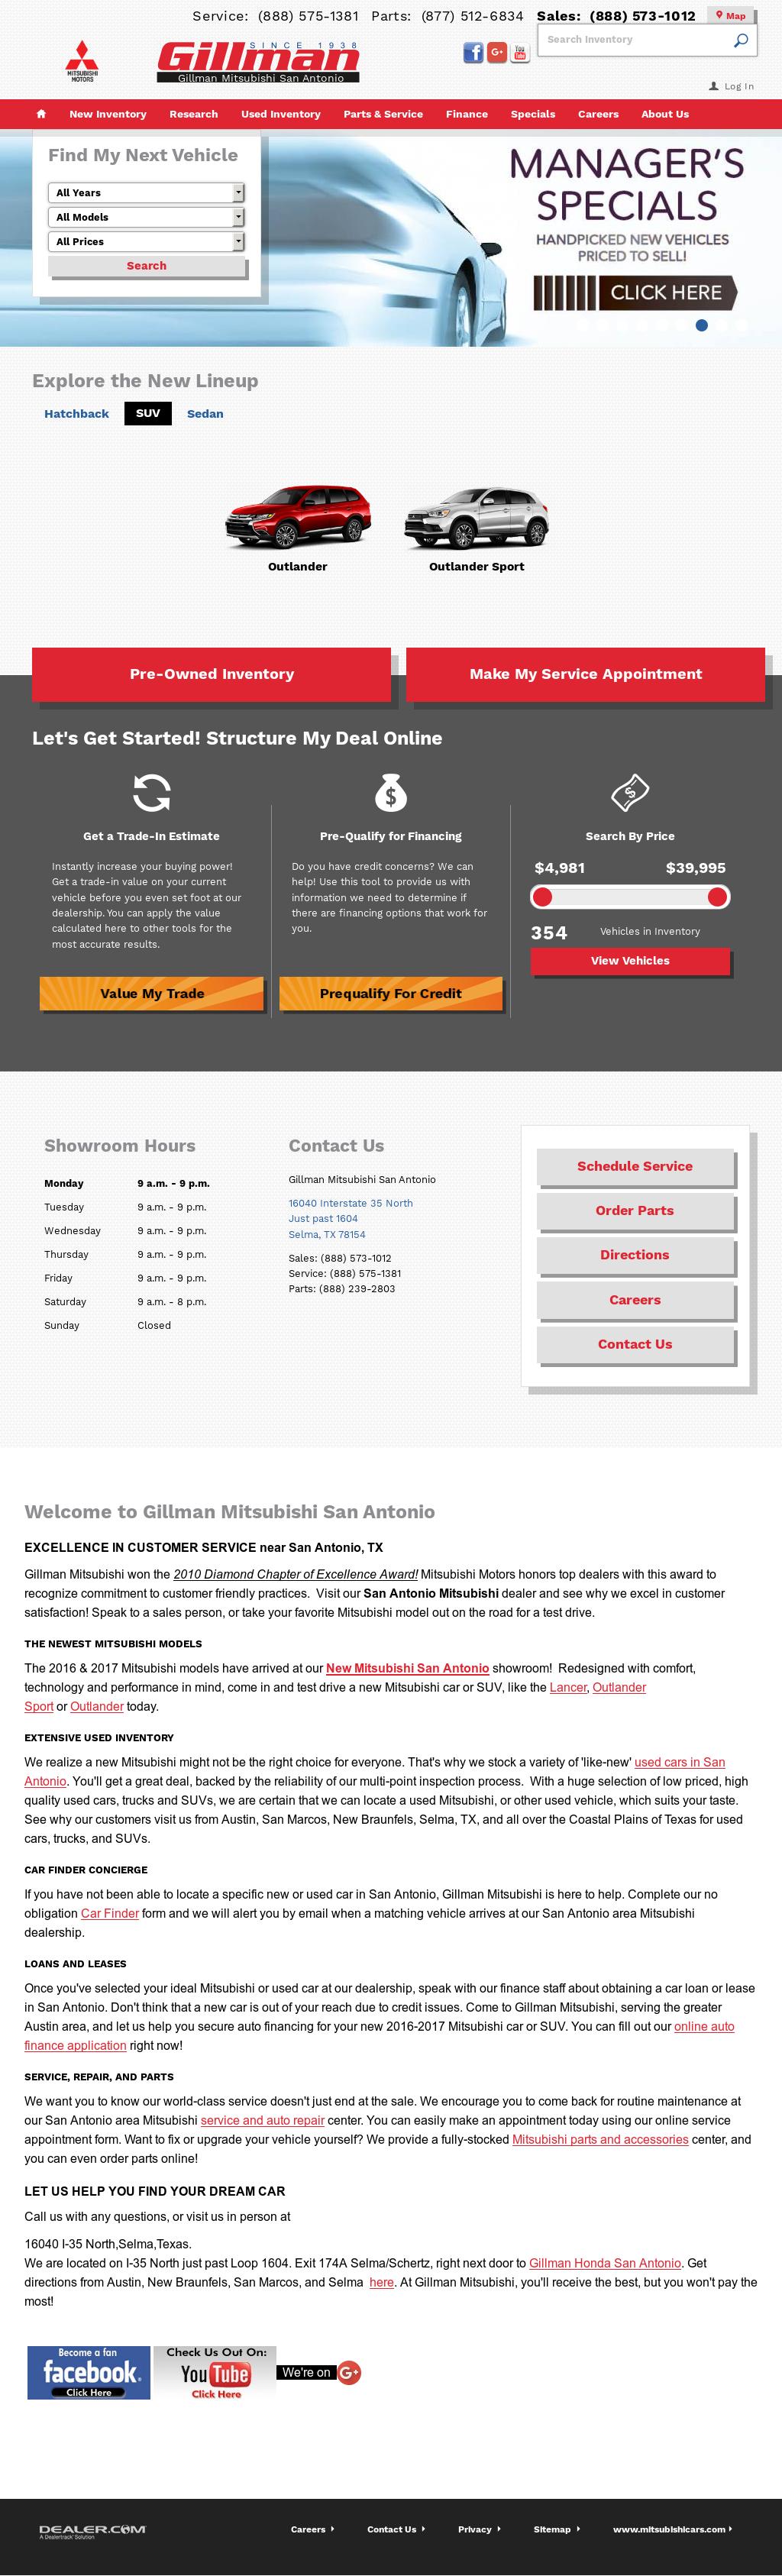 Marvelous Gillman Mitsubishi Of San Antonio Website History